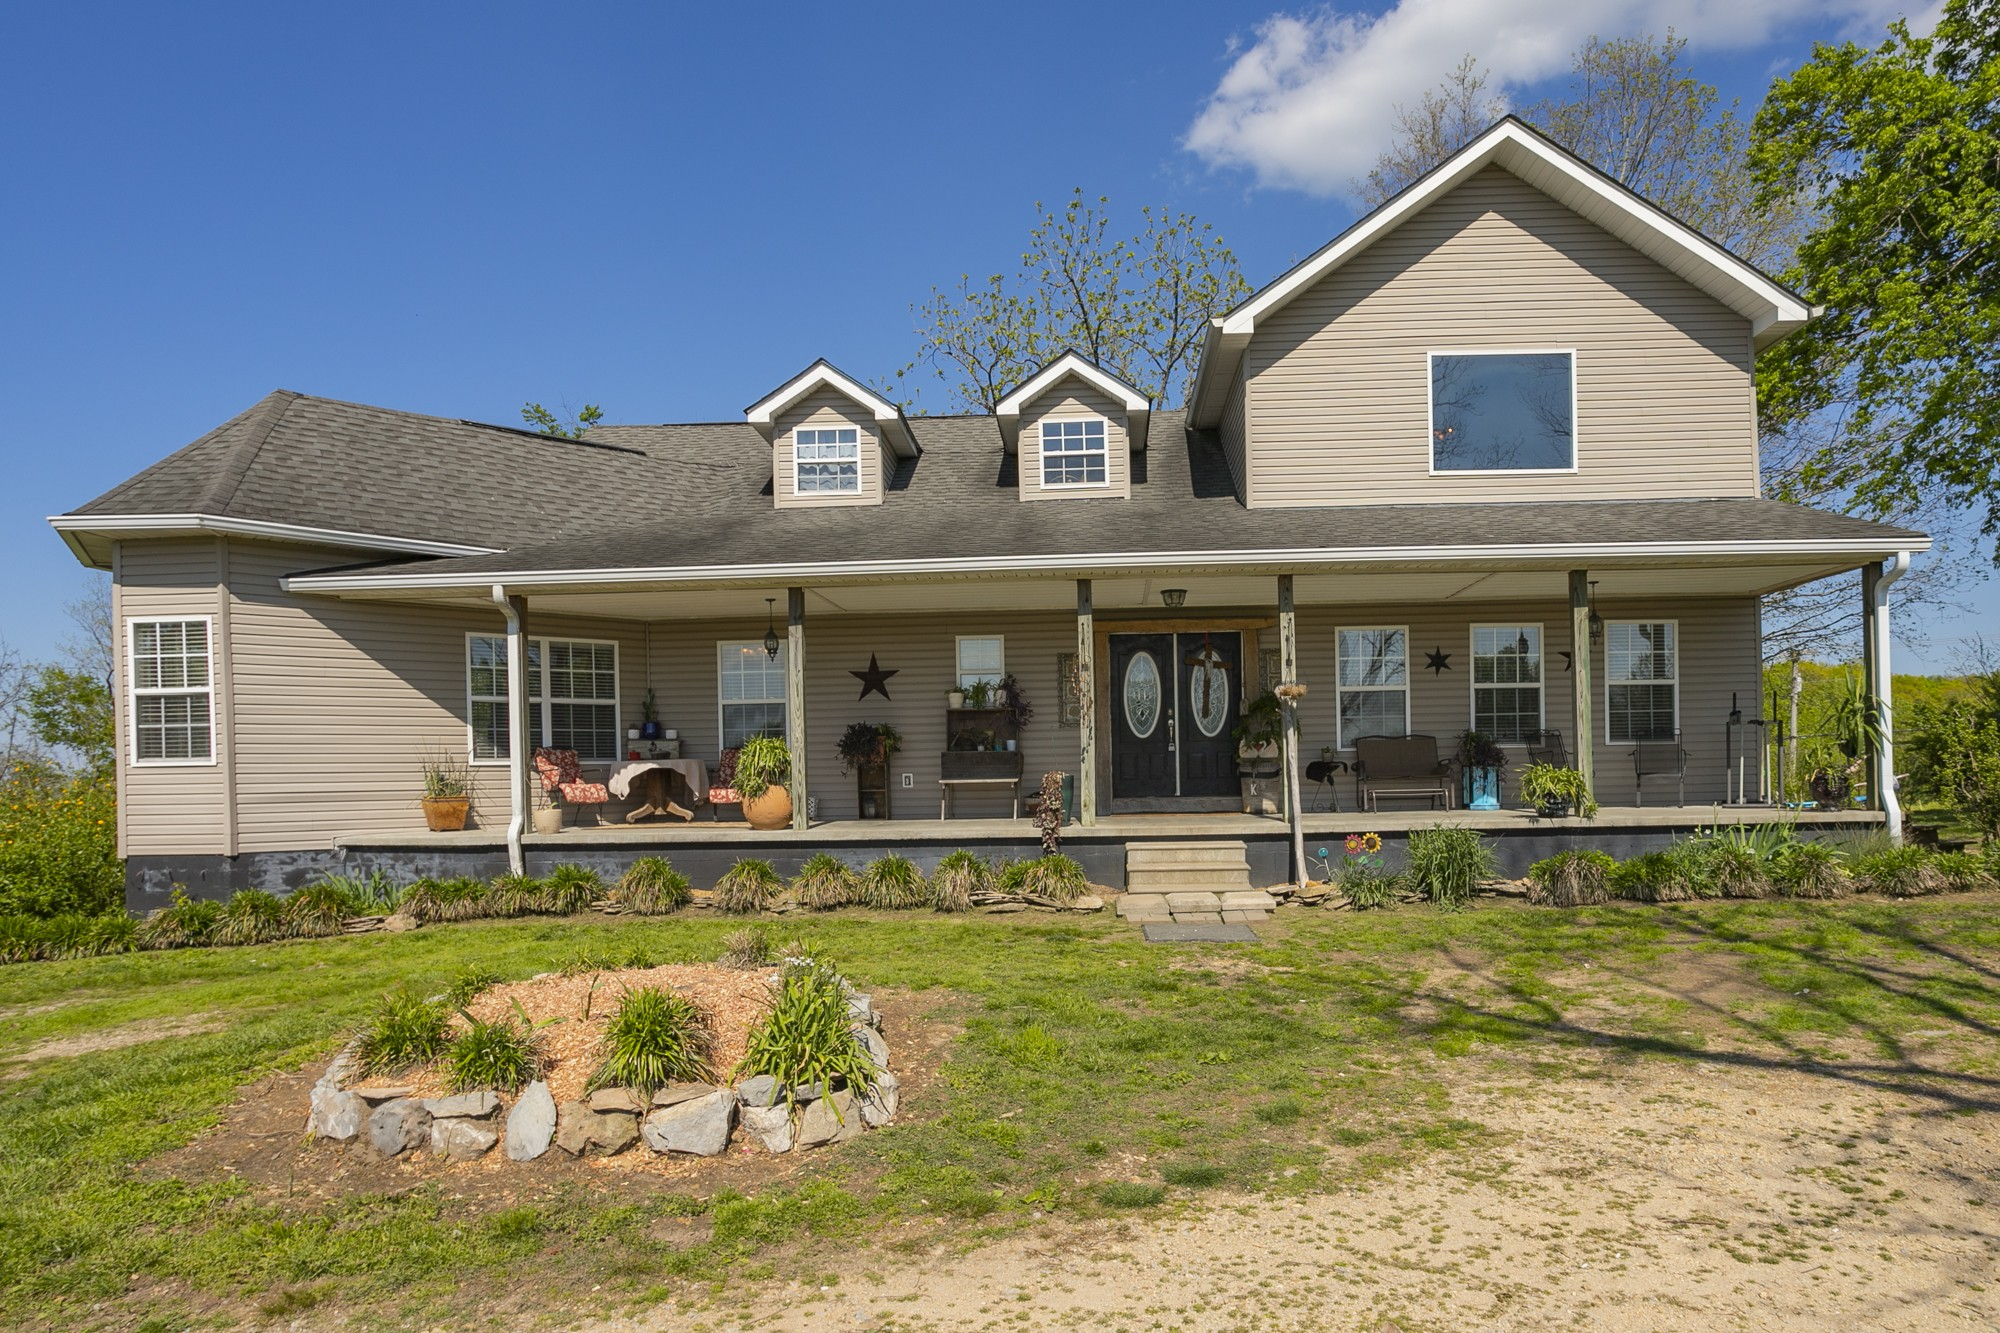 8871 New Lawrenceburg Hwy, Mount Pleasant, TN 38474 - Mount Pleasant, TN real estate listing